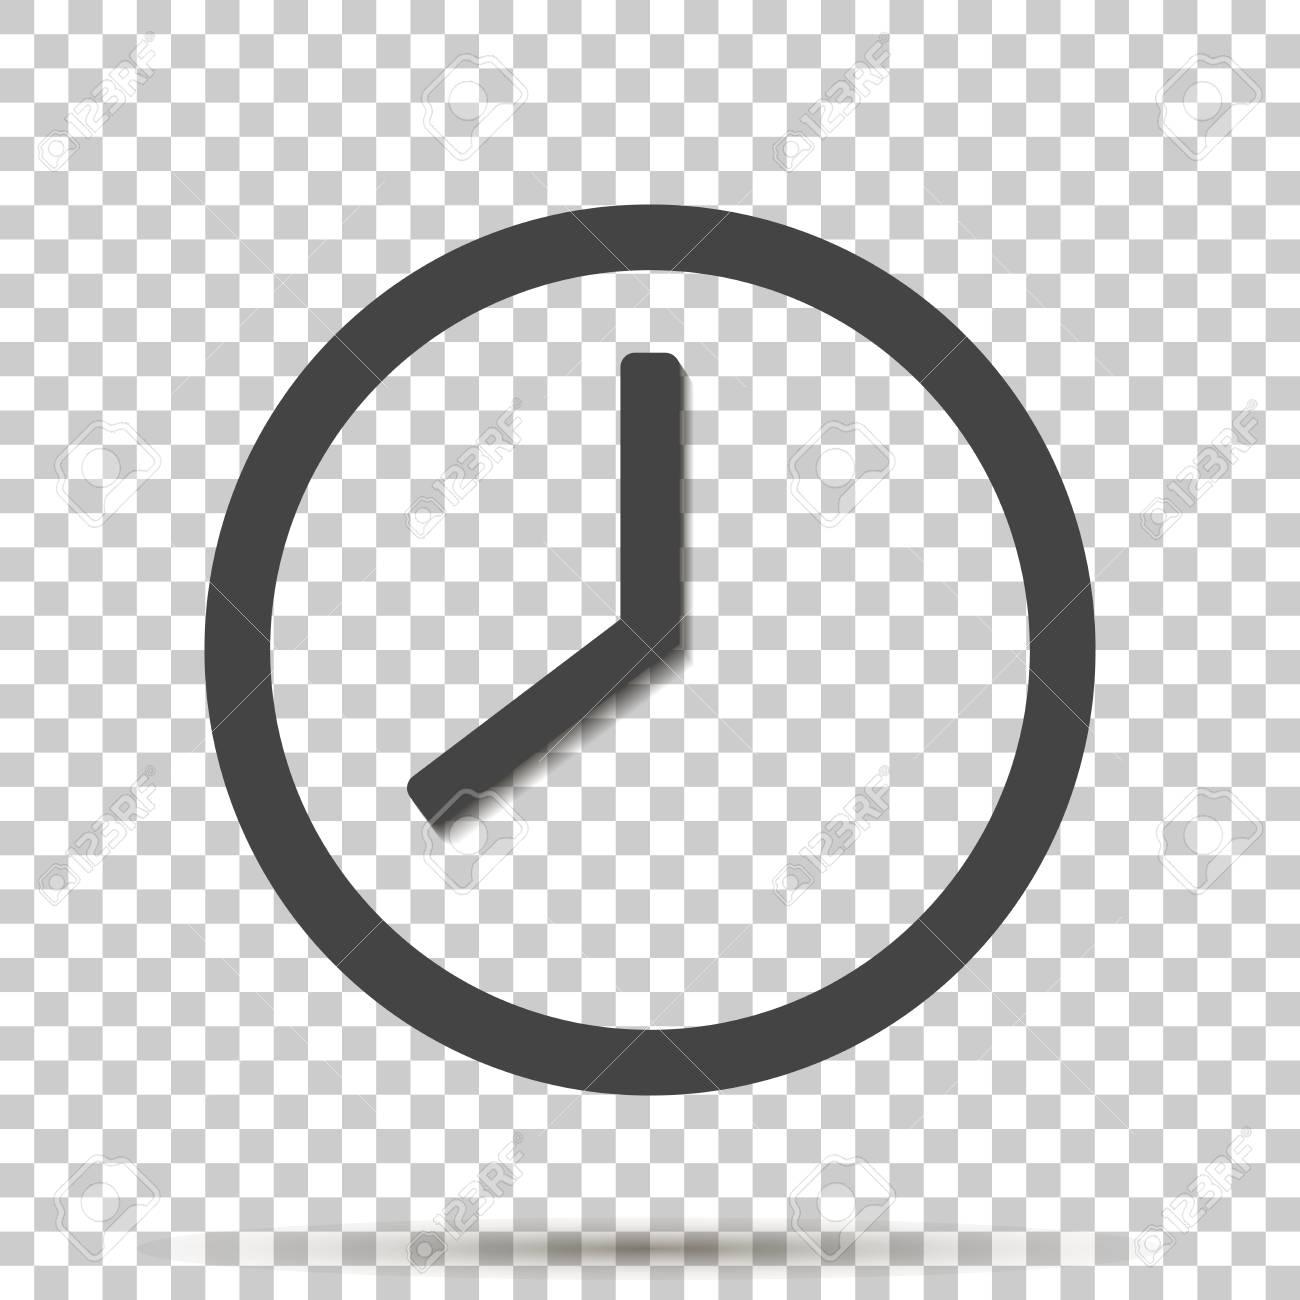 Clock icon on transparent background